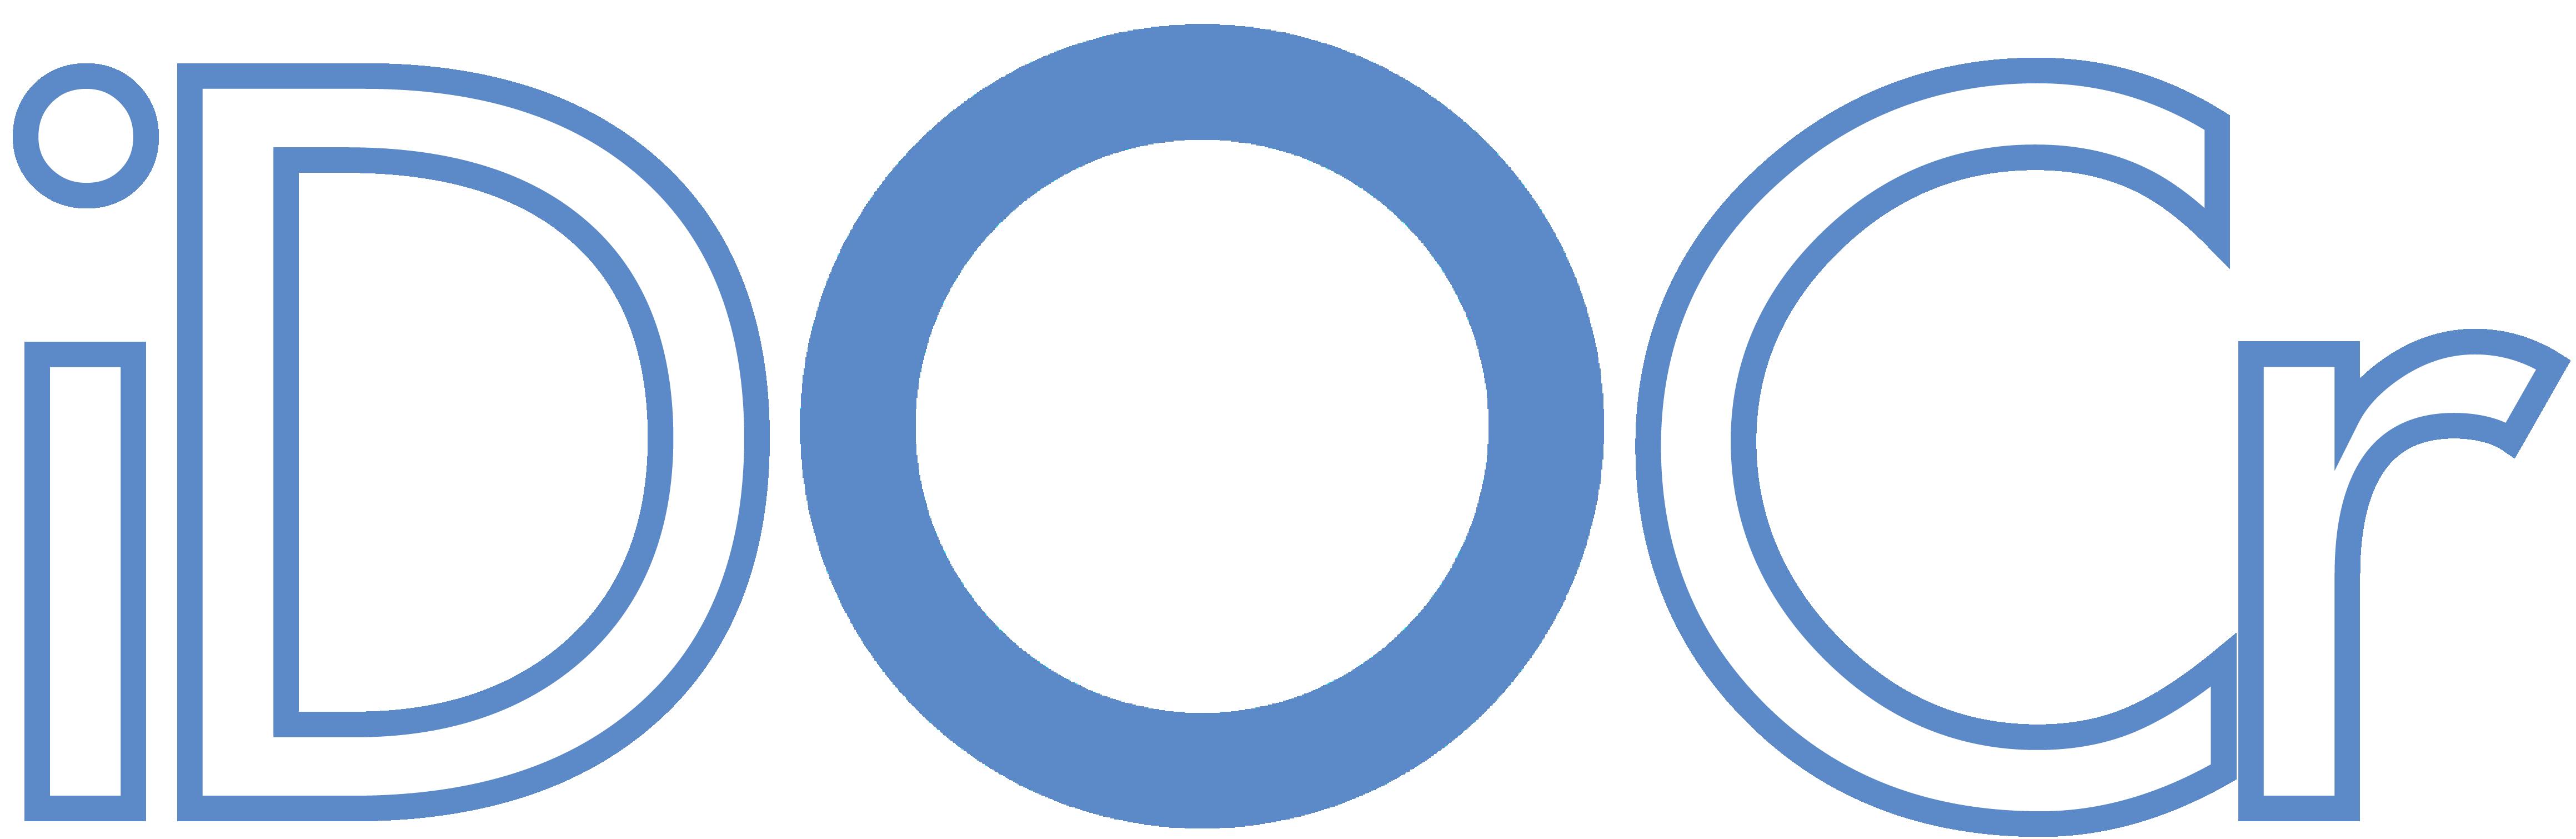 iDOCr